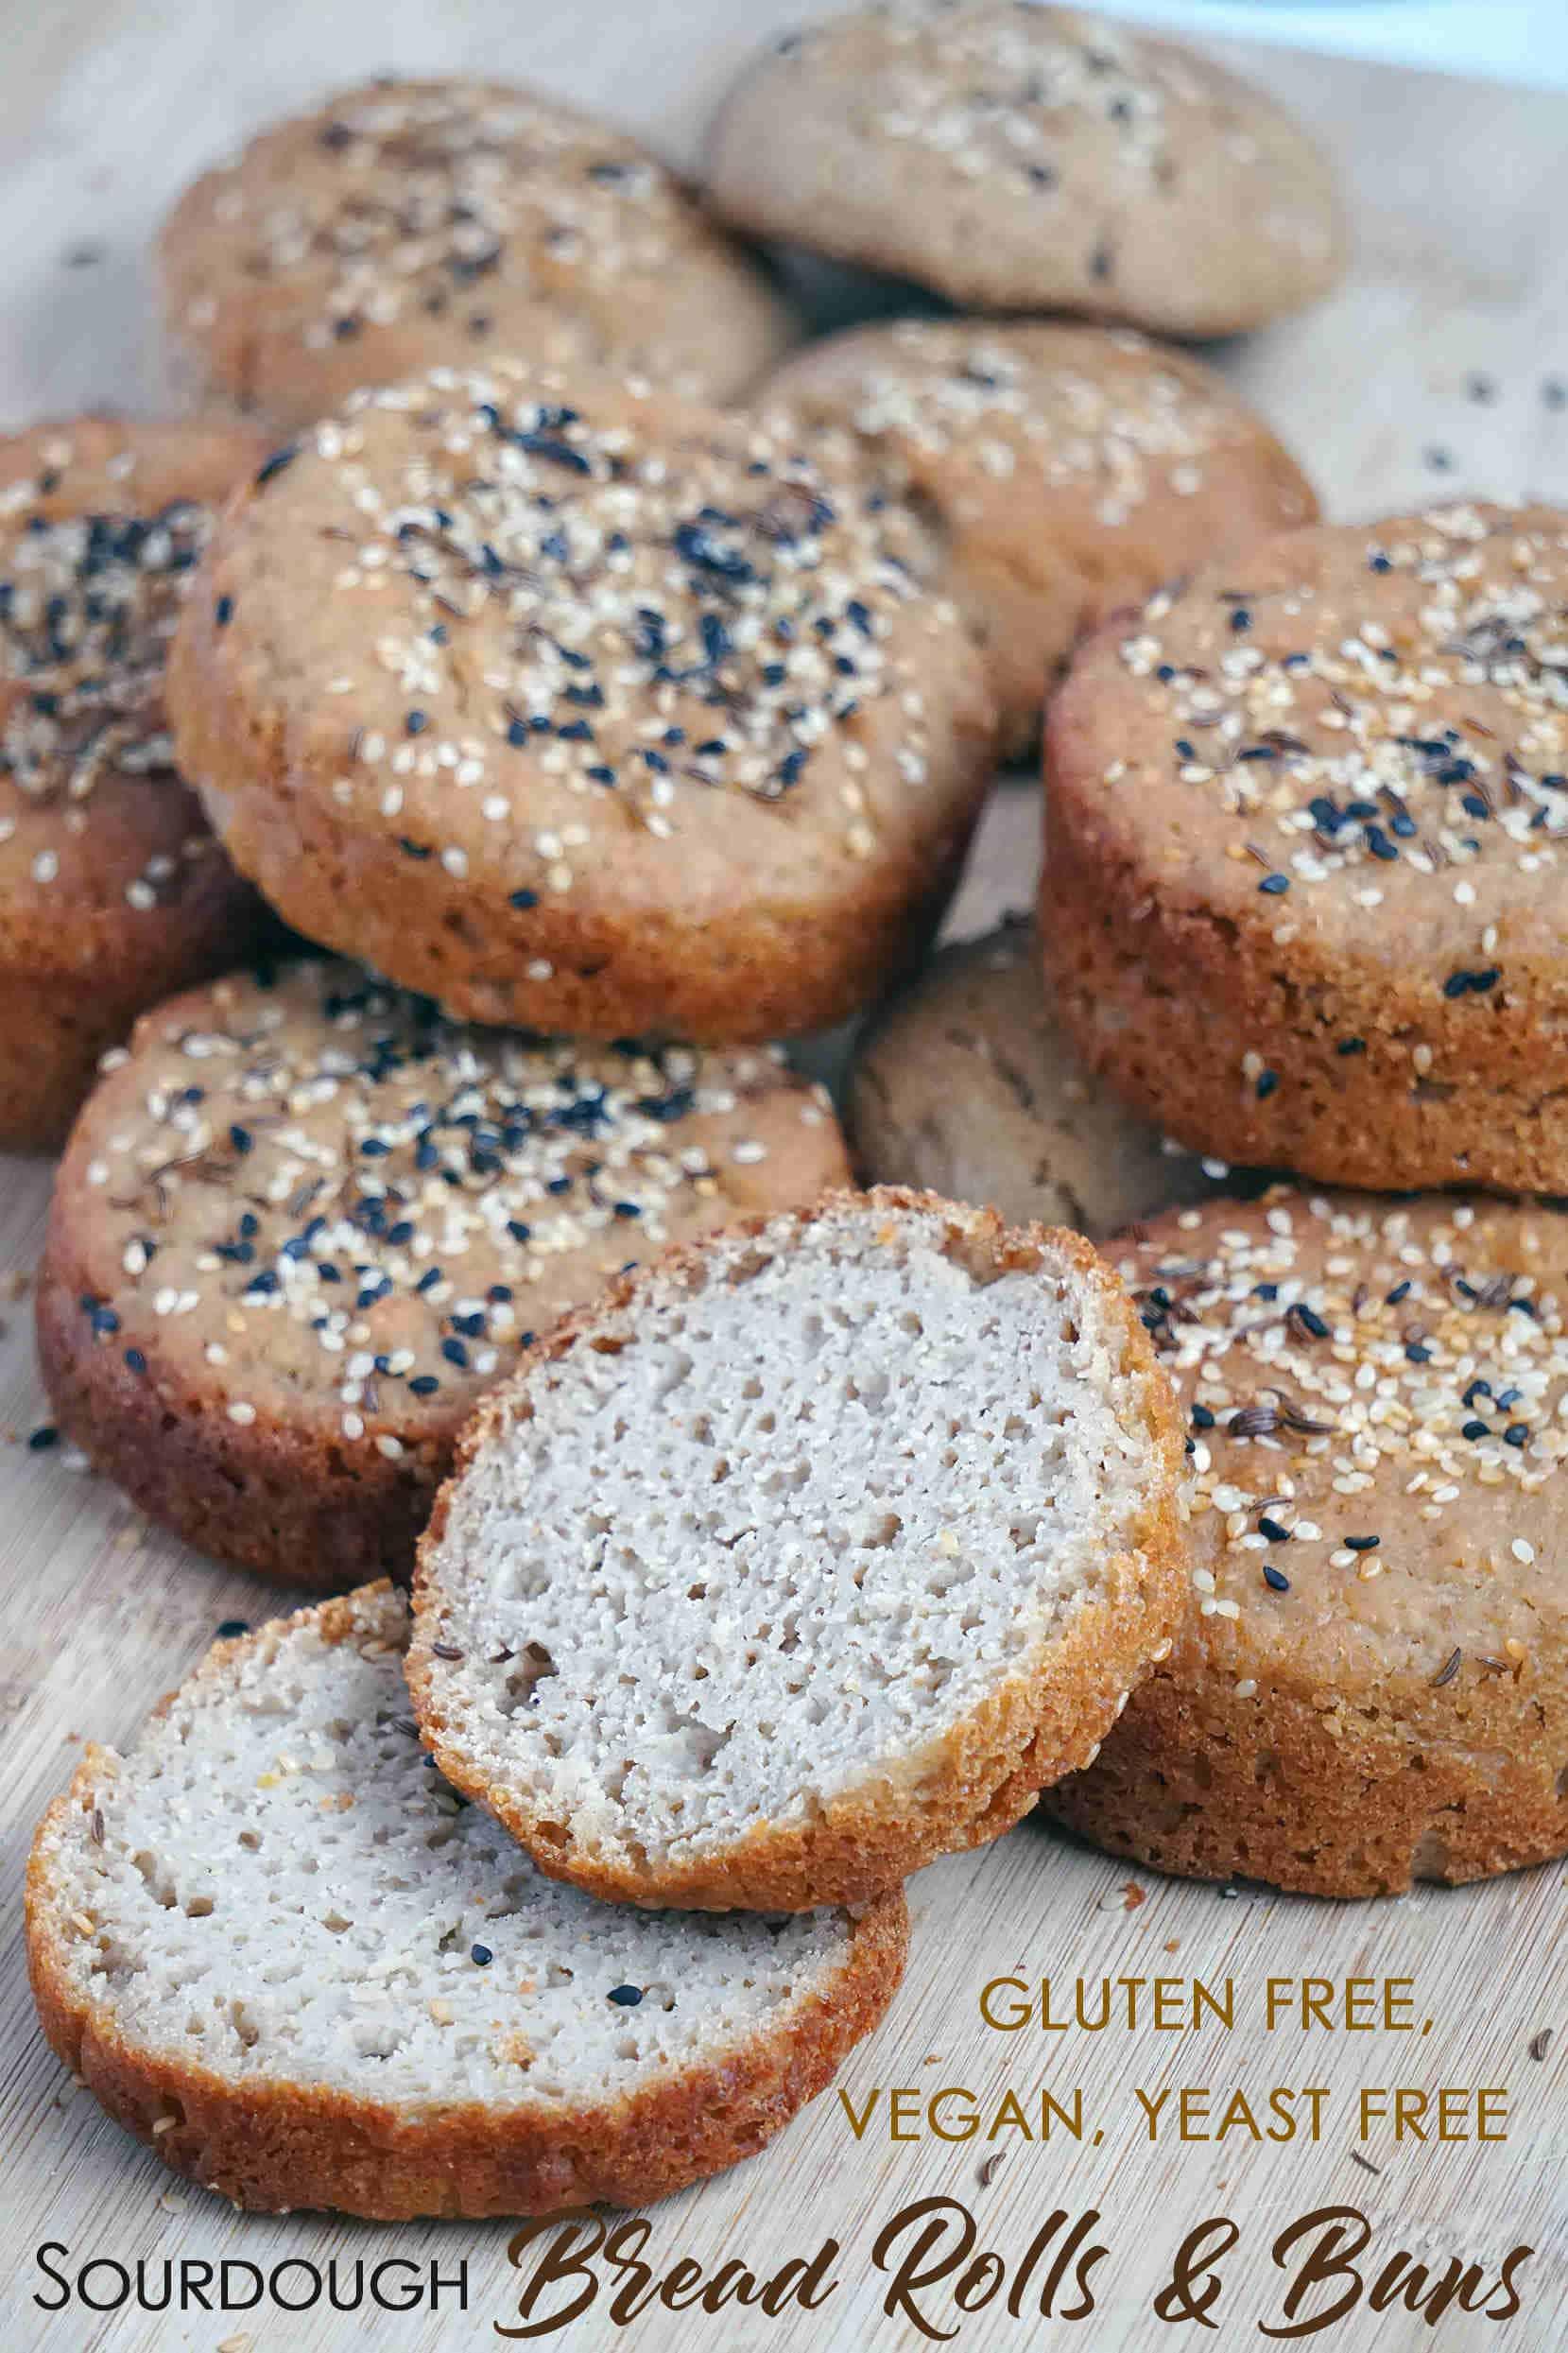 Vegan Gluten Free Sourdough Bread Rolls and Buns recipe: dairy free, egg free, yeast free, xanthan gum free, vegan, soy and nut free.